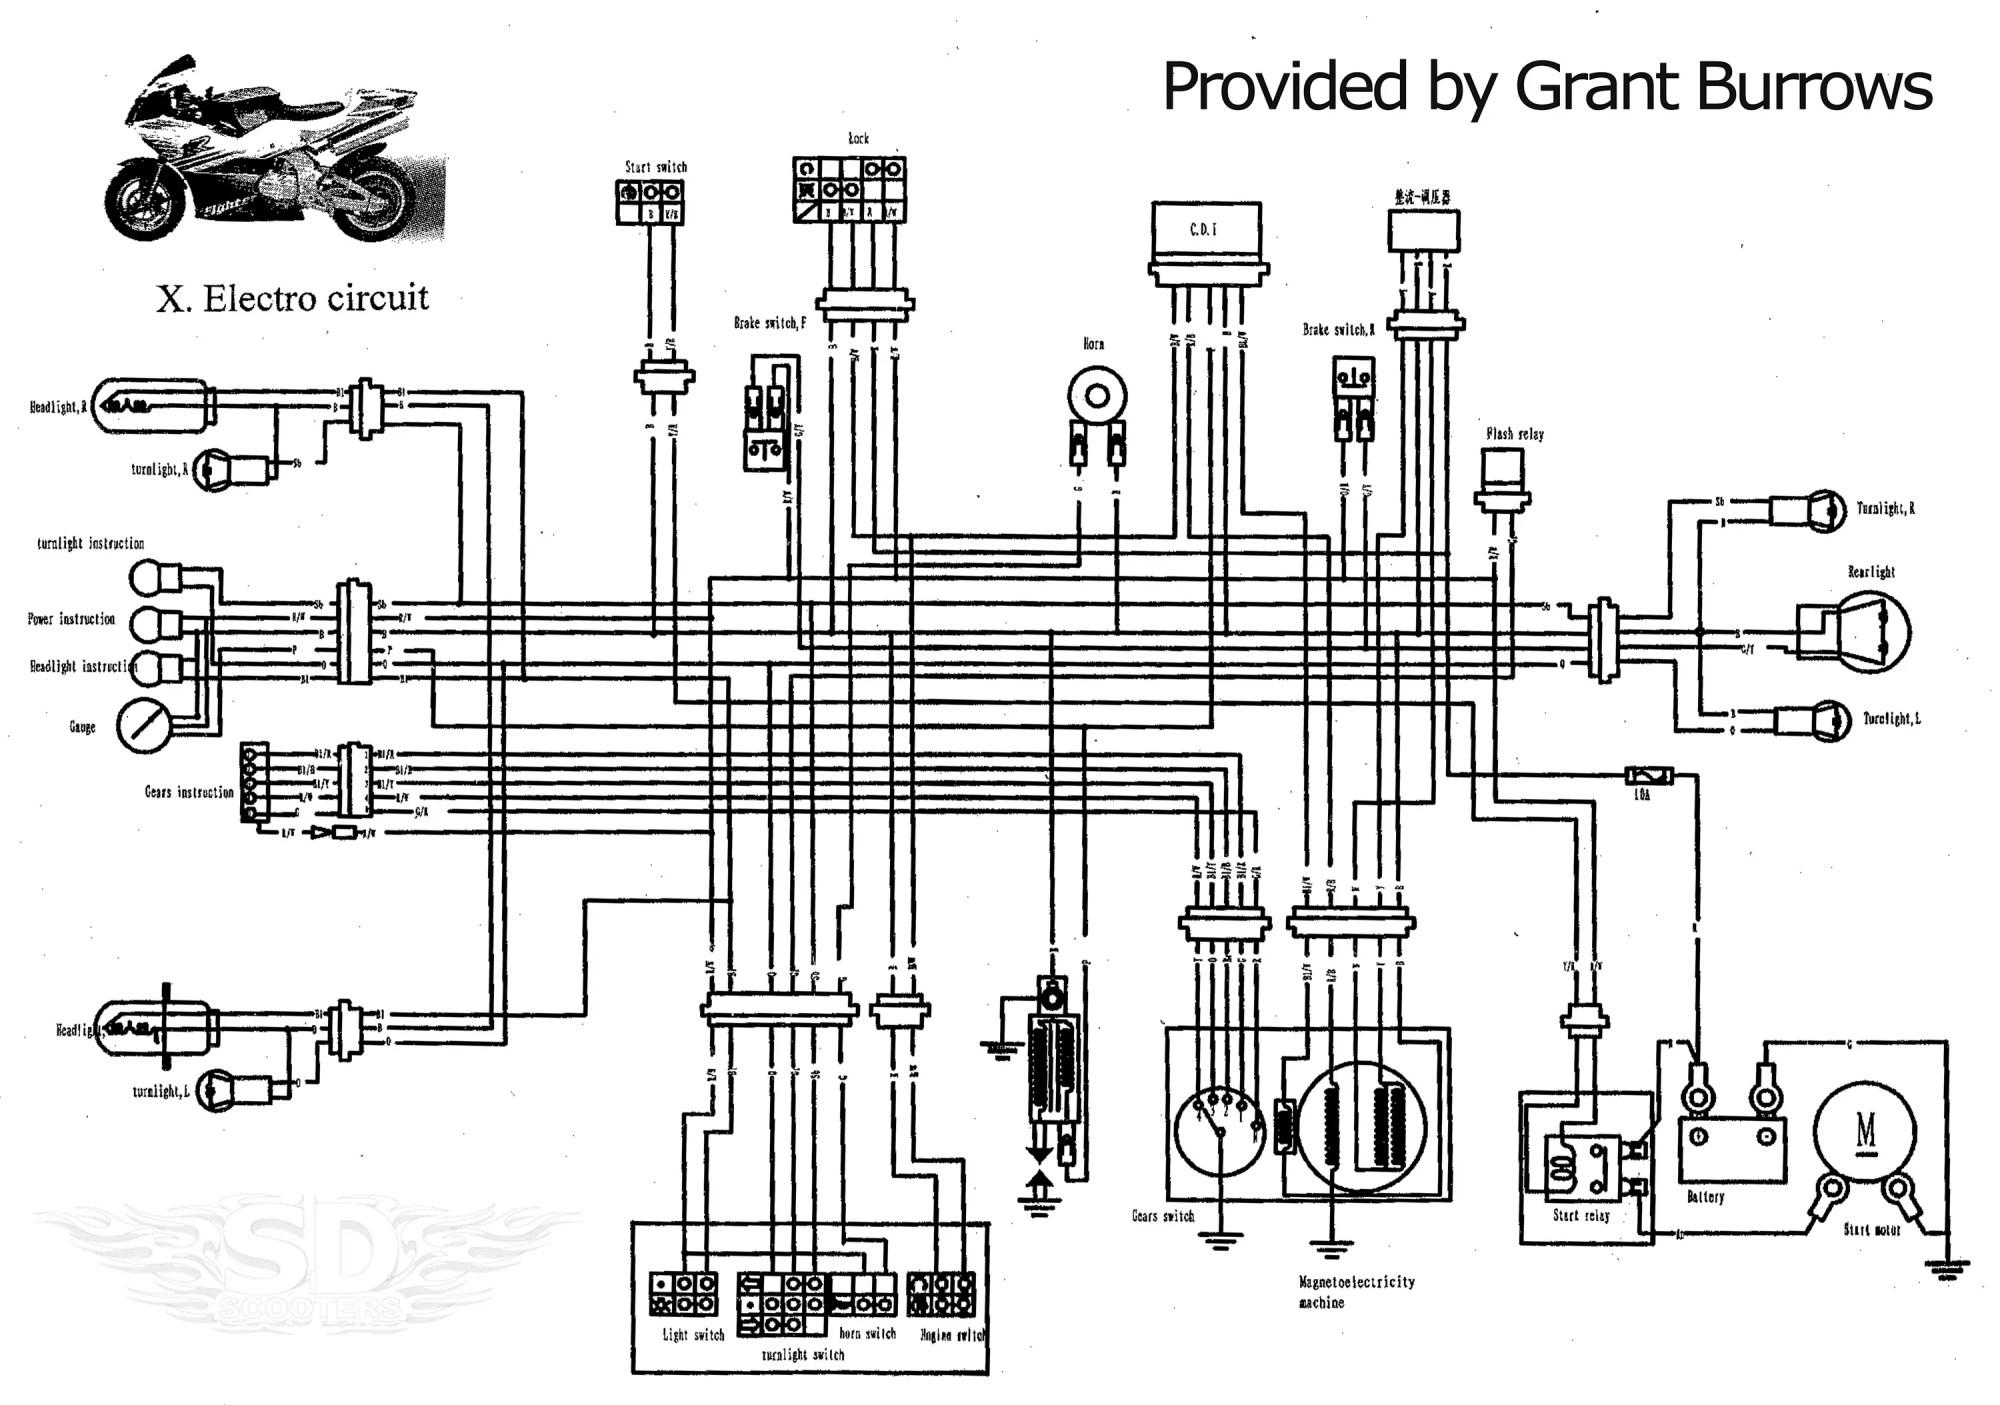 hight resolution of kikker 5150 wiring diagram